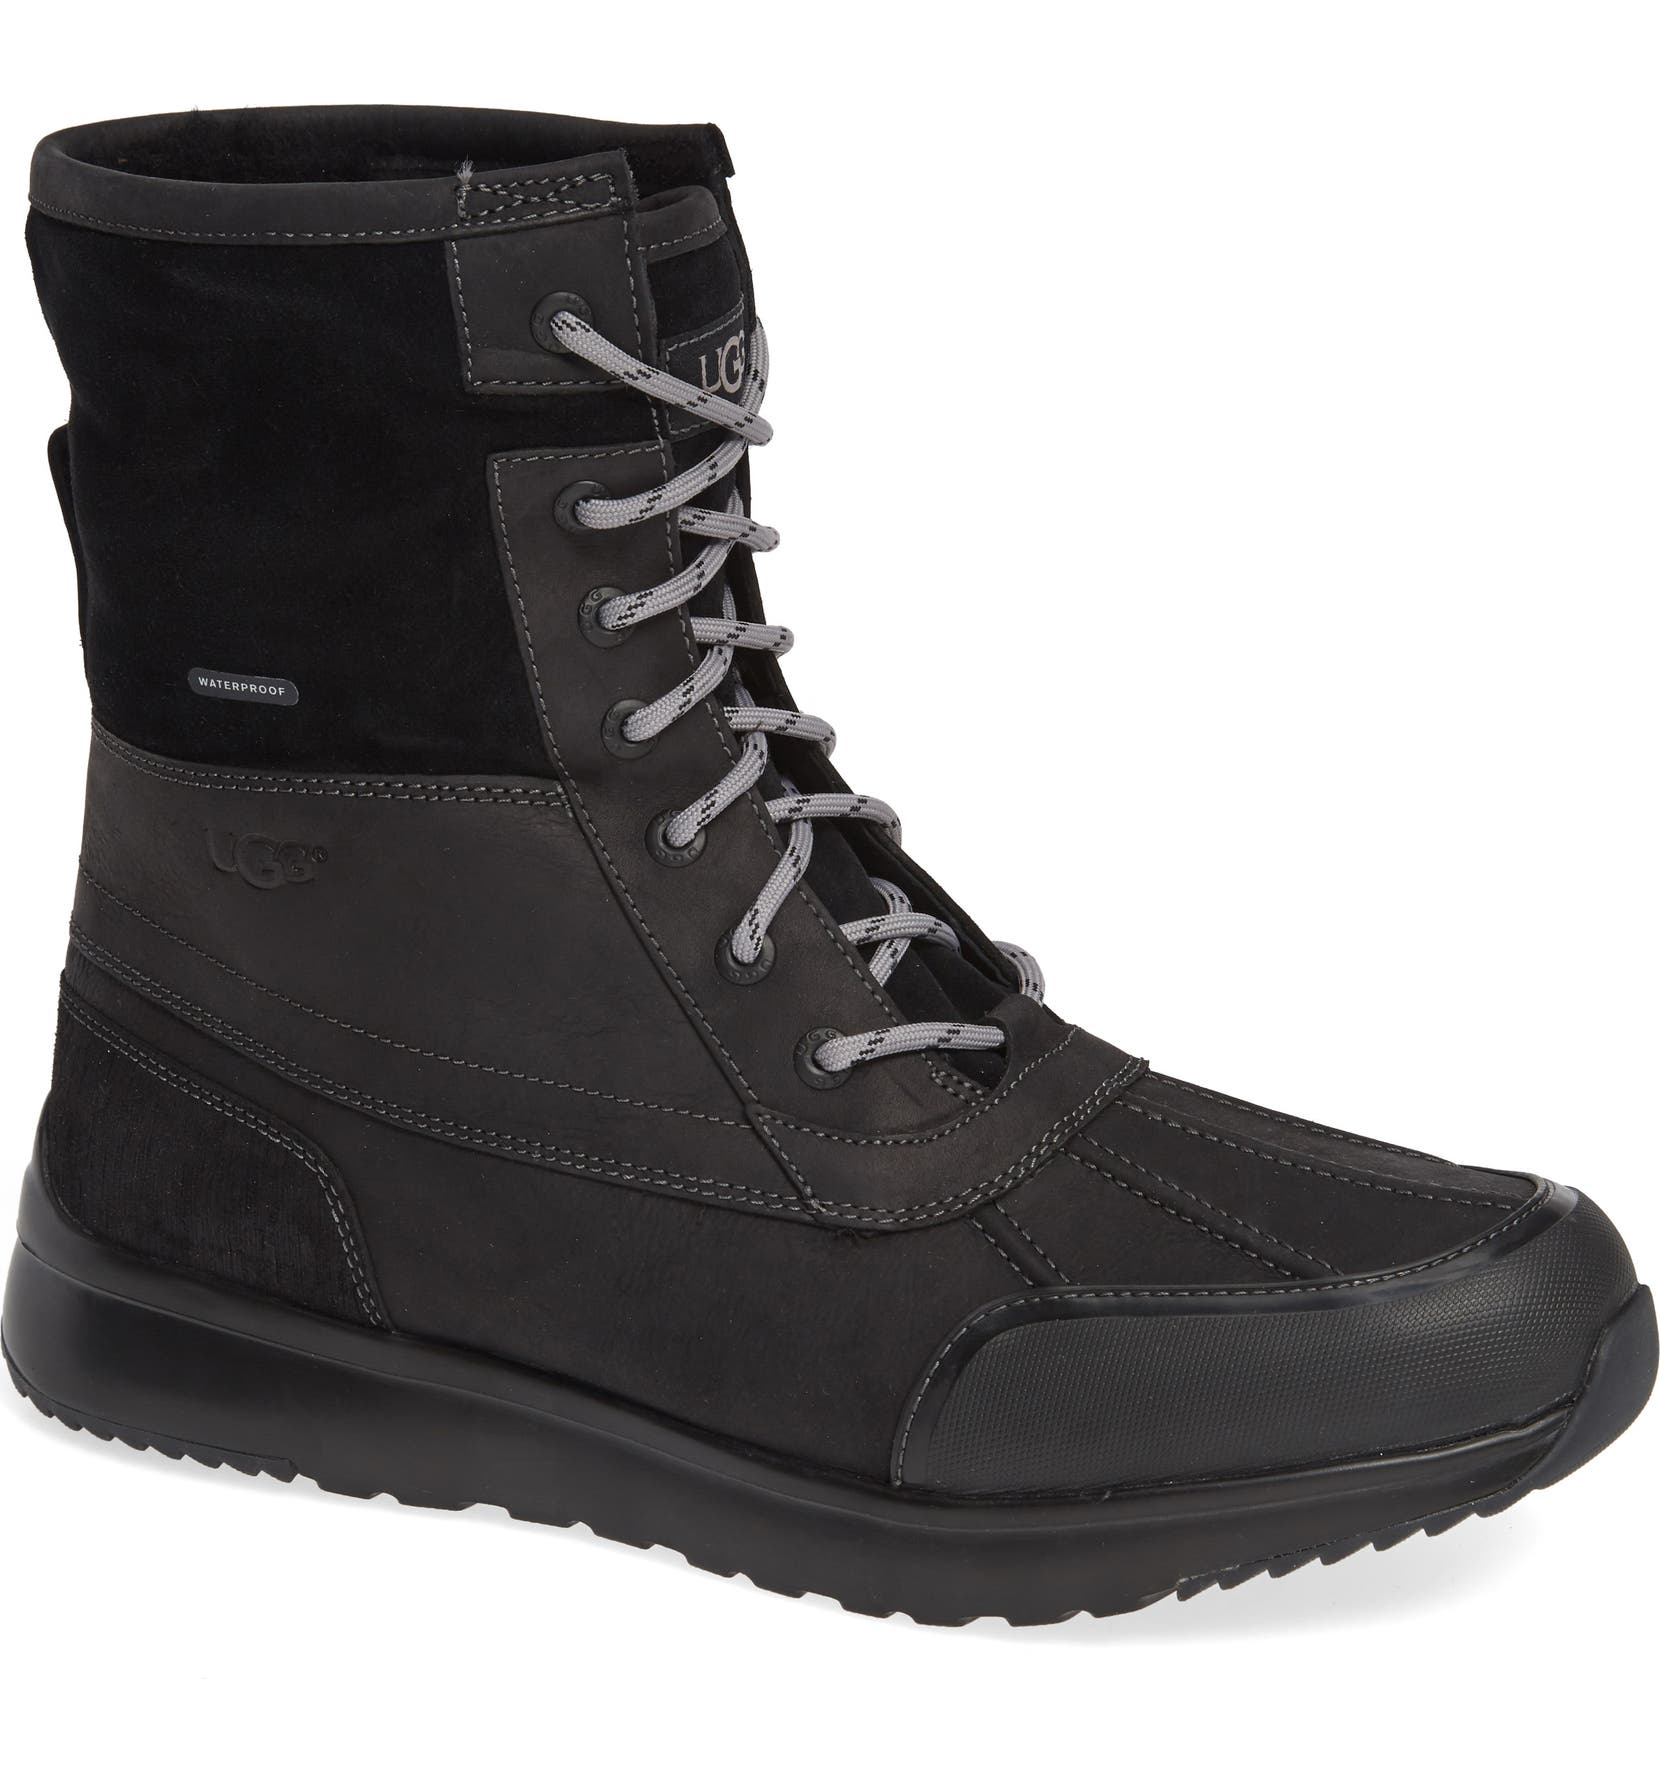 07e624435f4 Eliasson Waterproof Snow Boot